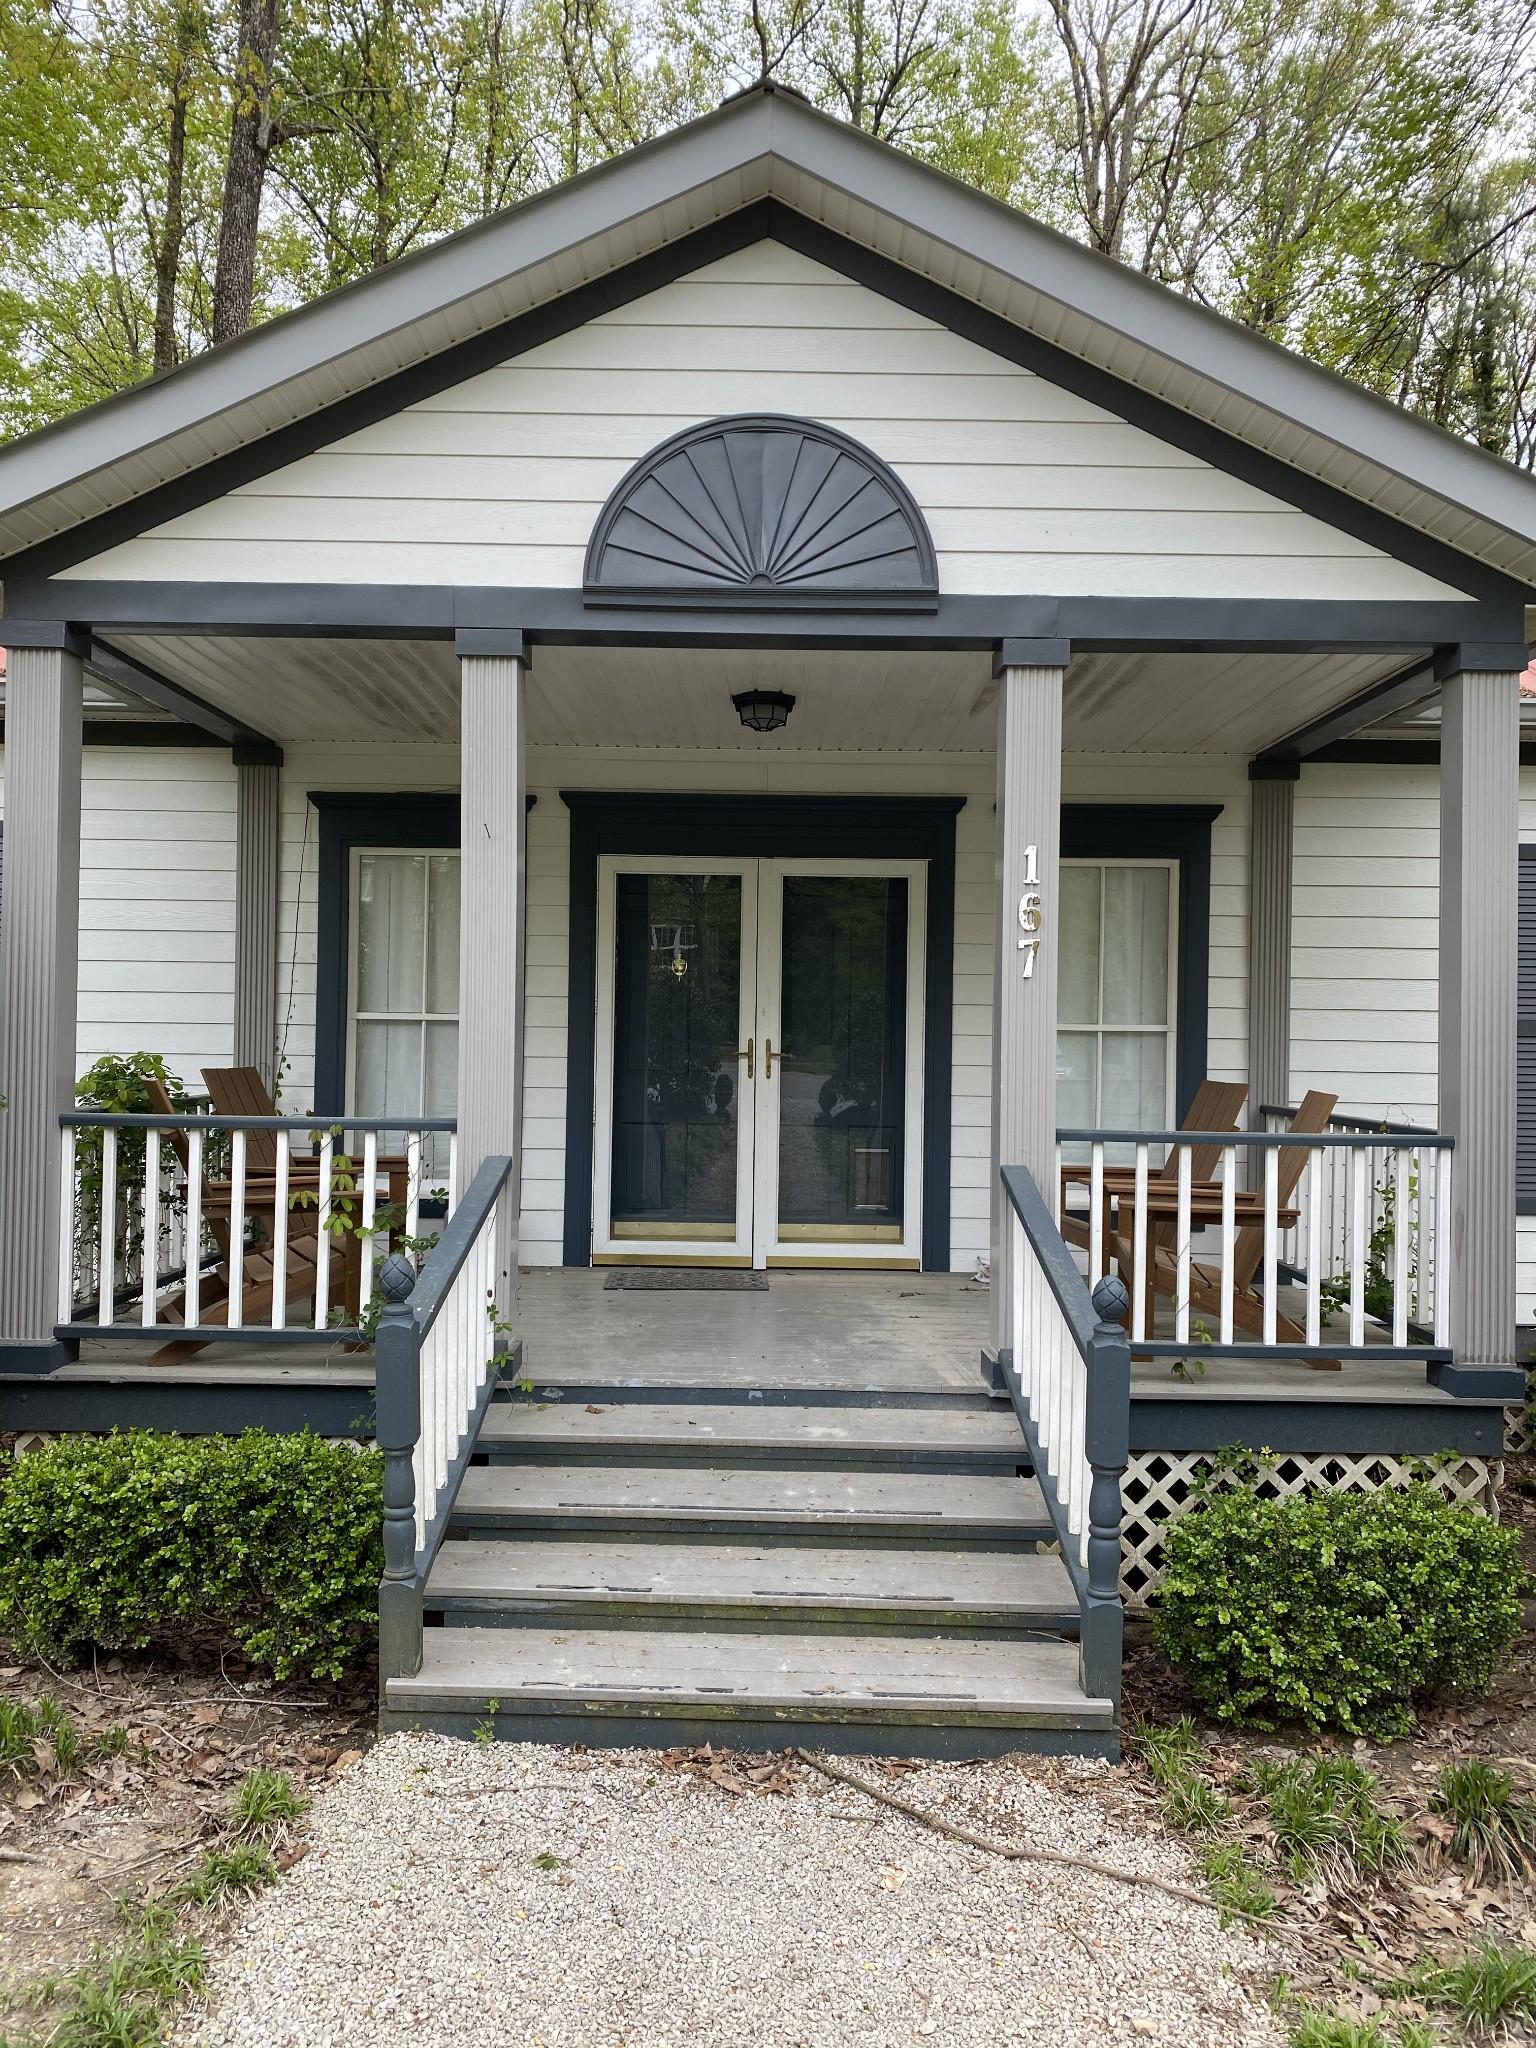 167 S Carolina Ave Property Photo - Sewanee, TN real estate listing